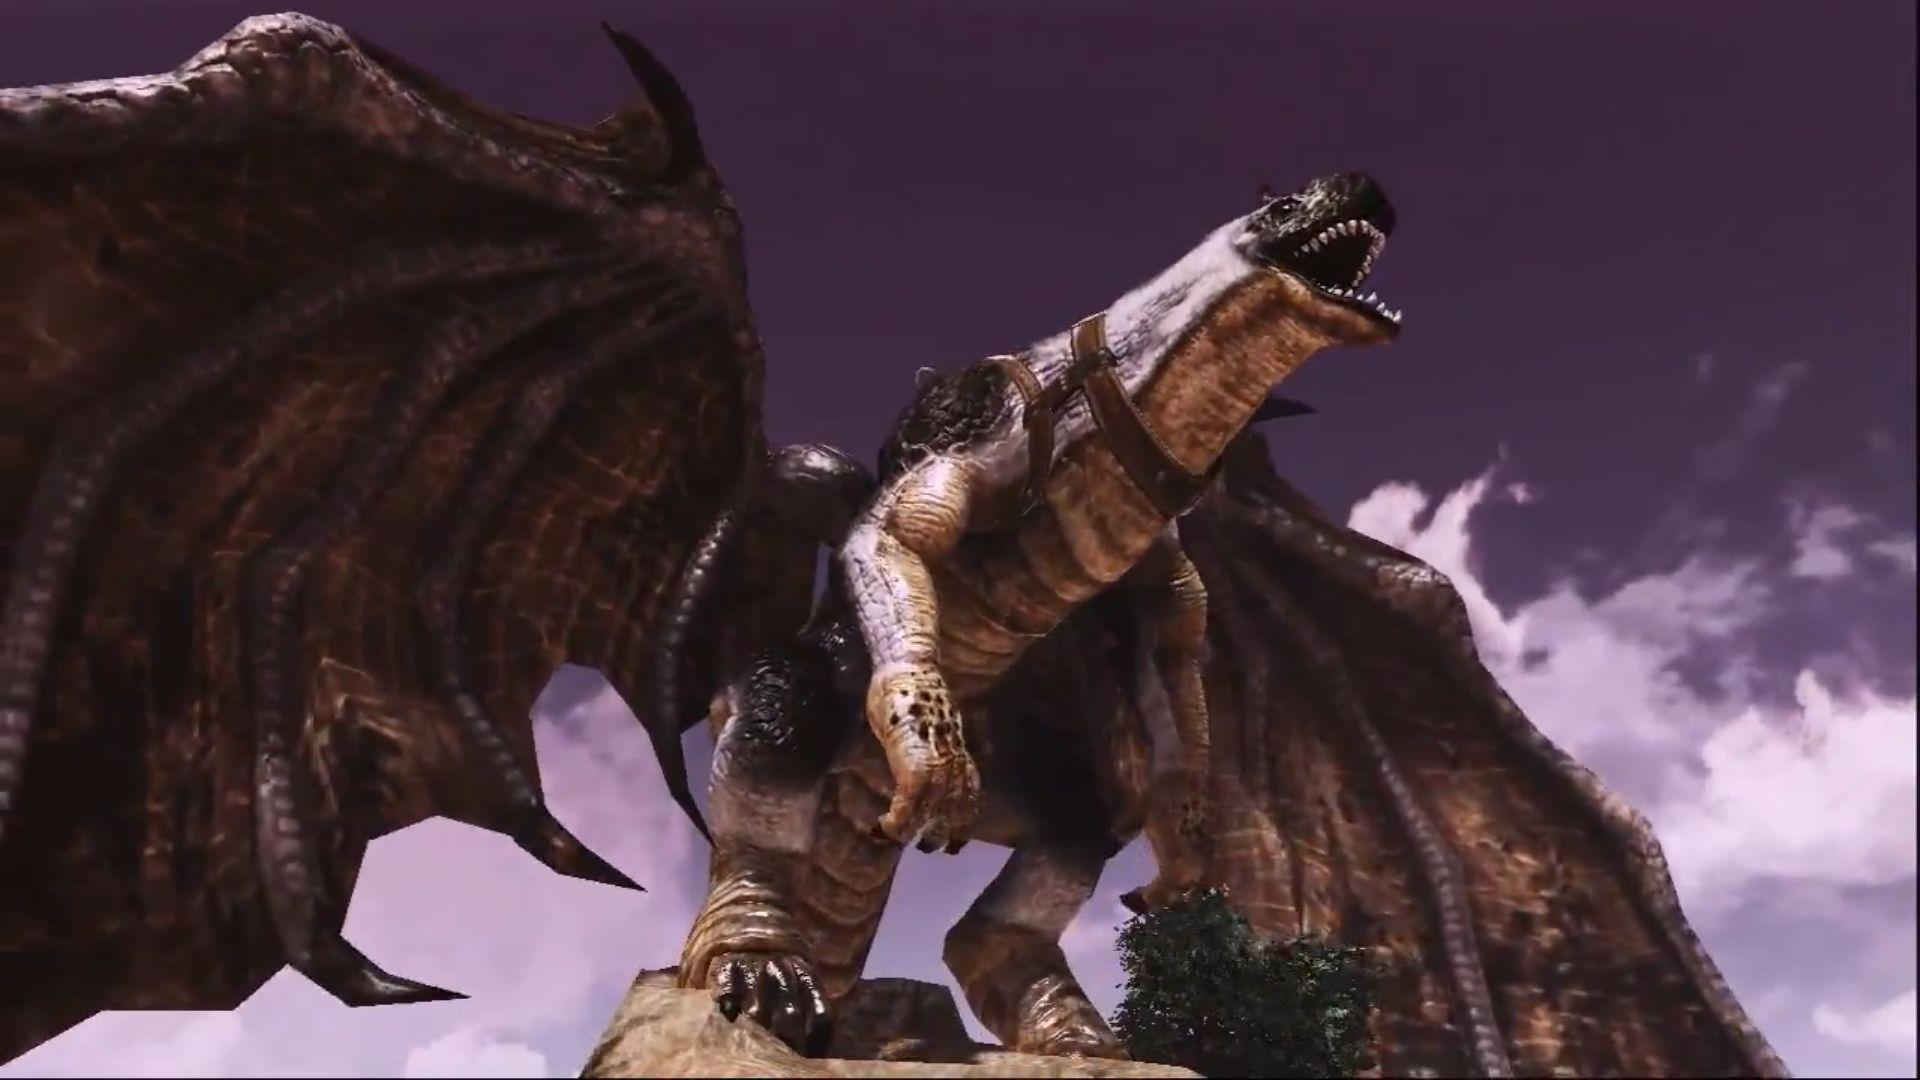 crimson dragon wallpaper - photo #16